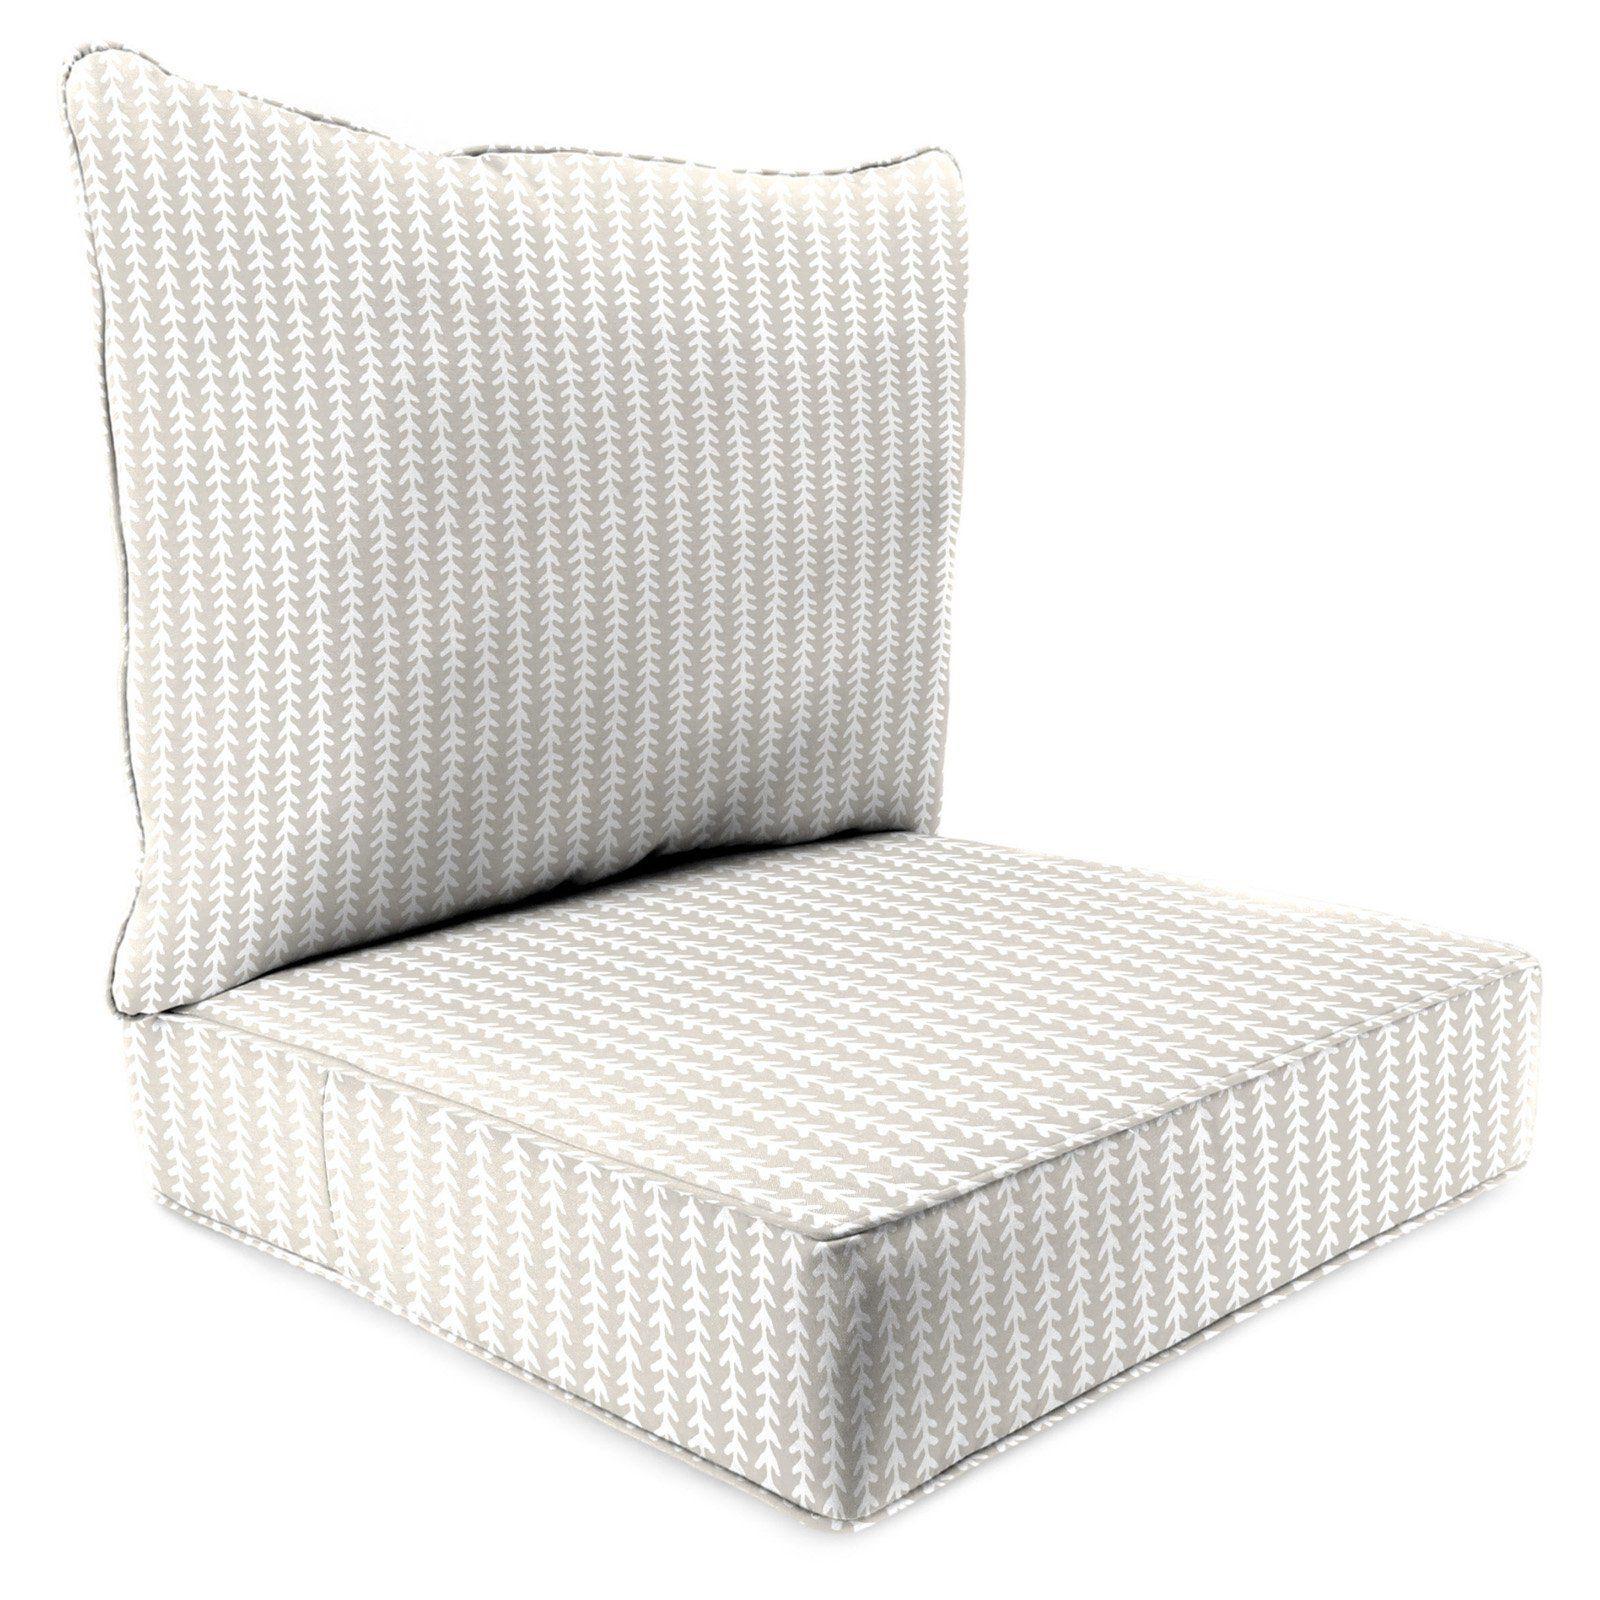 Jordan Manufacturing 2 Piece Deep Seat Chair Cushion Vine Oyster